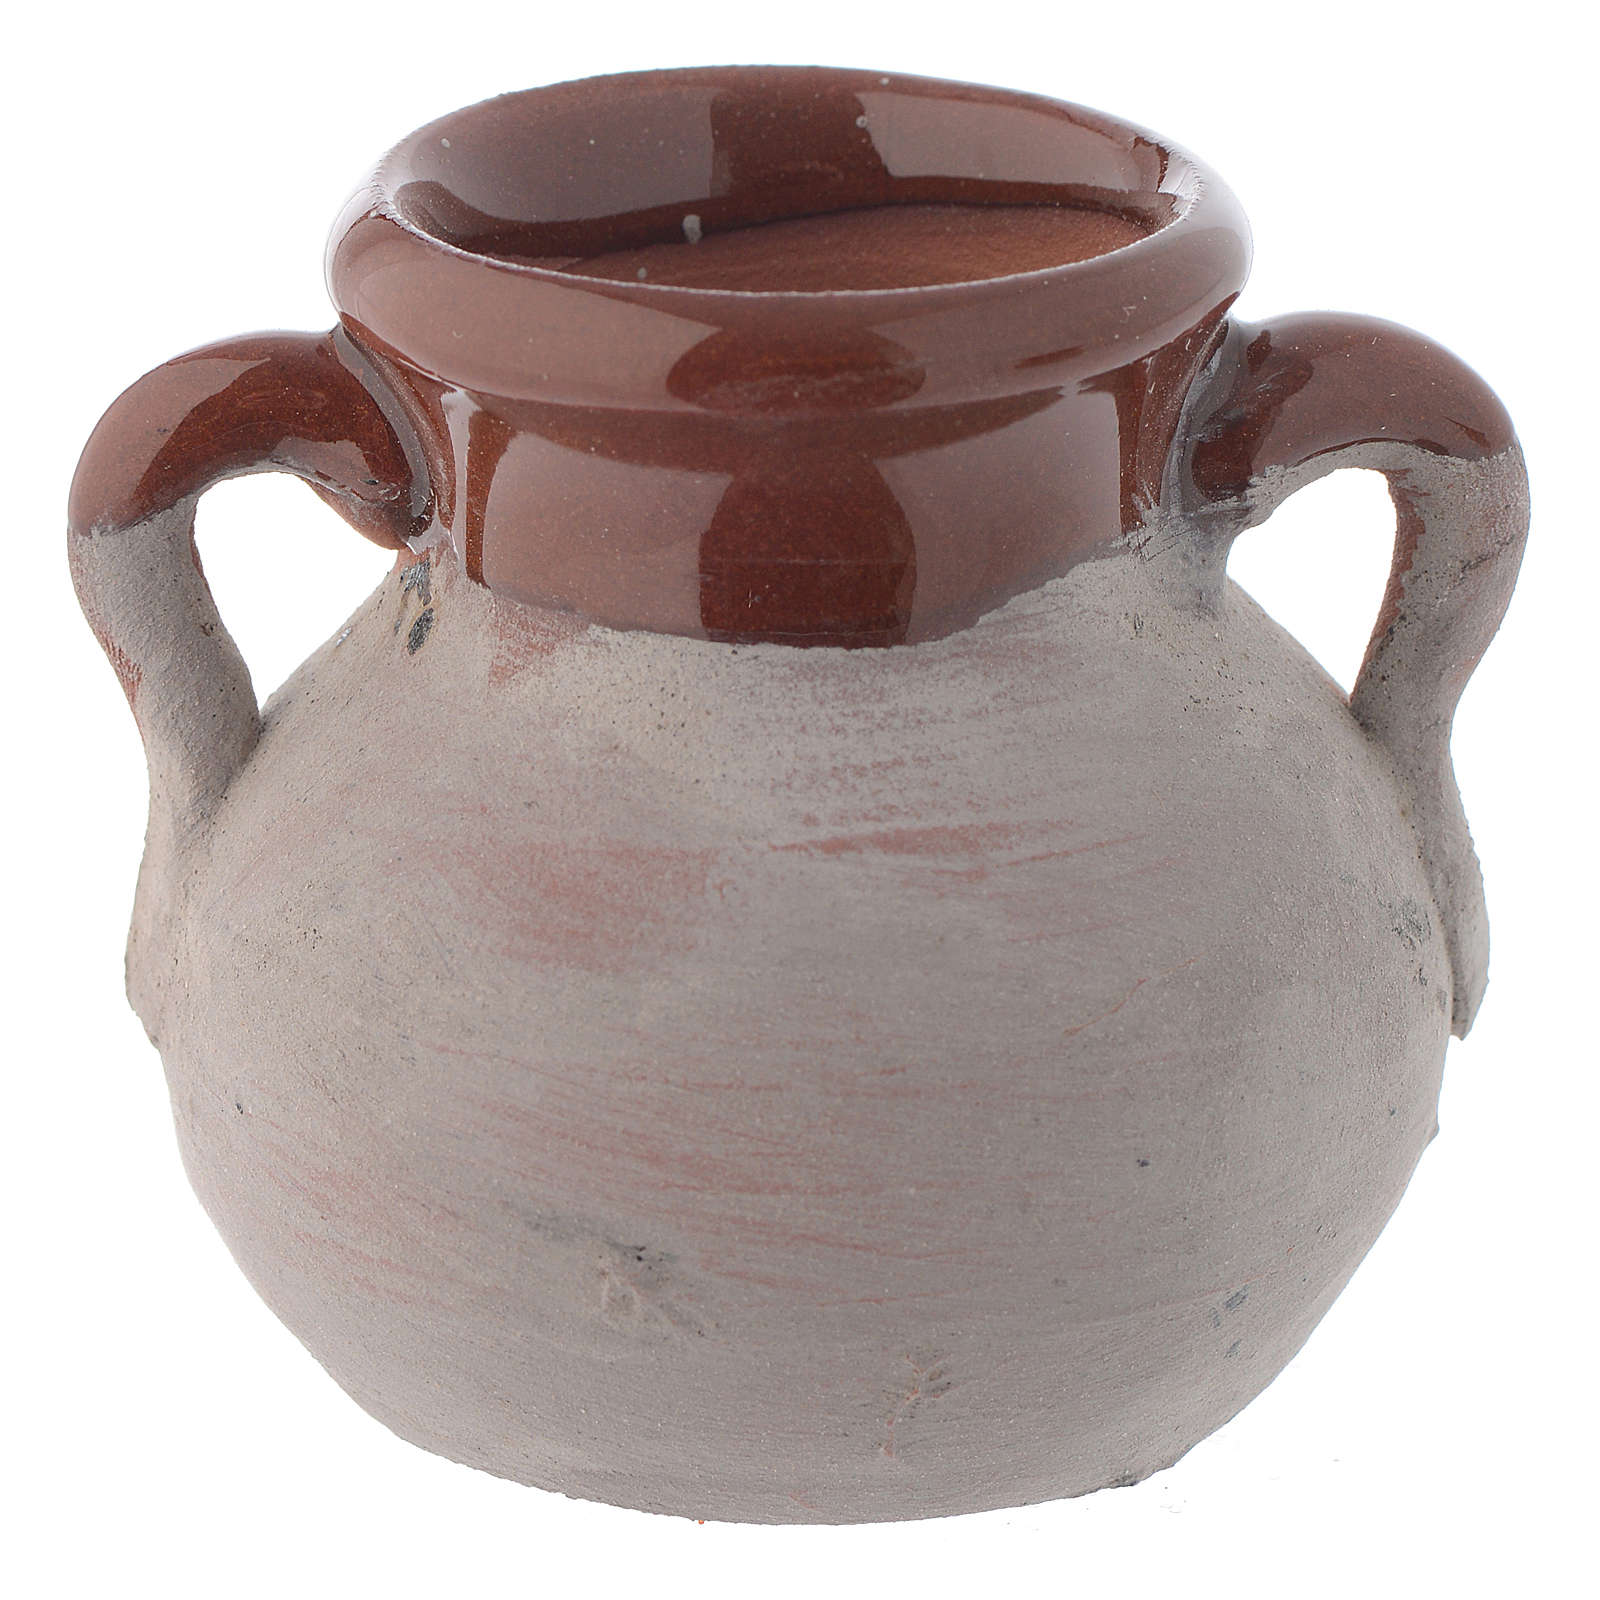 Pentola rustica ceramica h reale 4 cm presepe 4